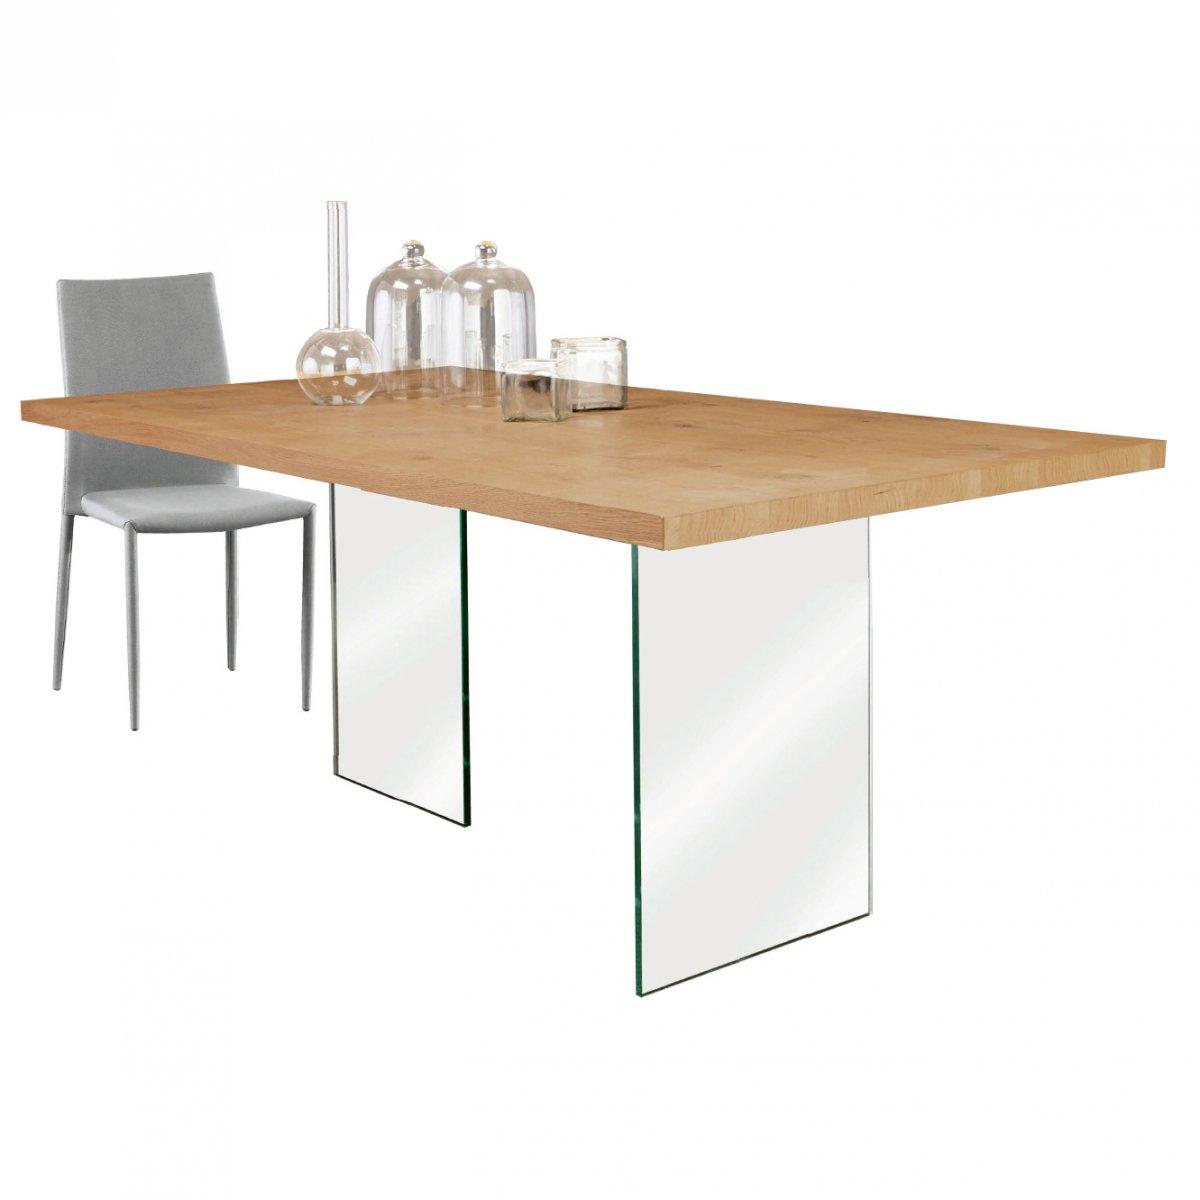 Loft: TAVOLO ROVERE E CRISTALLO LF130 Loft | tavoli e sedie - tavoli